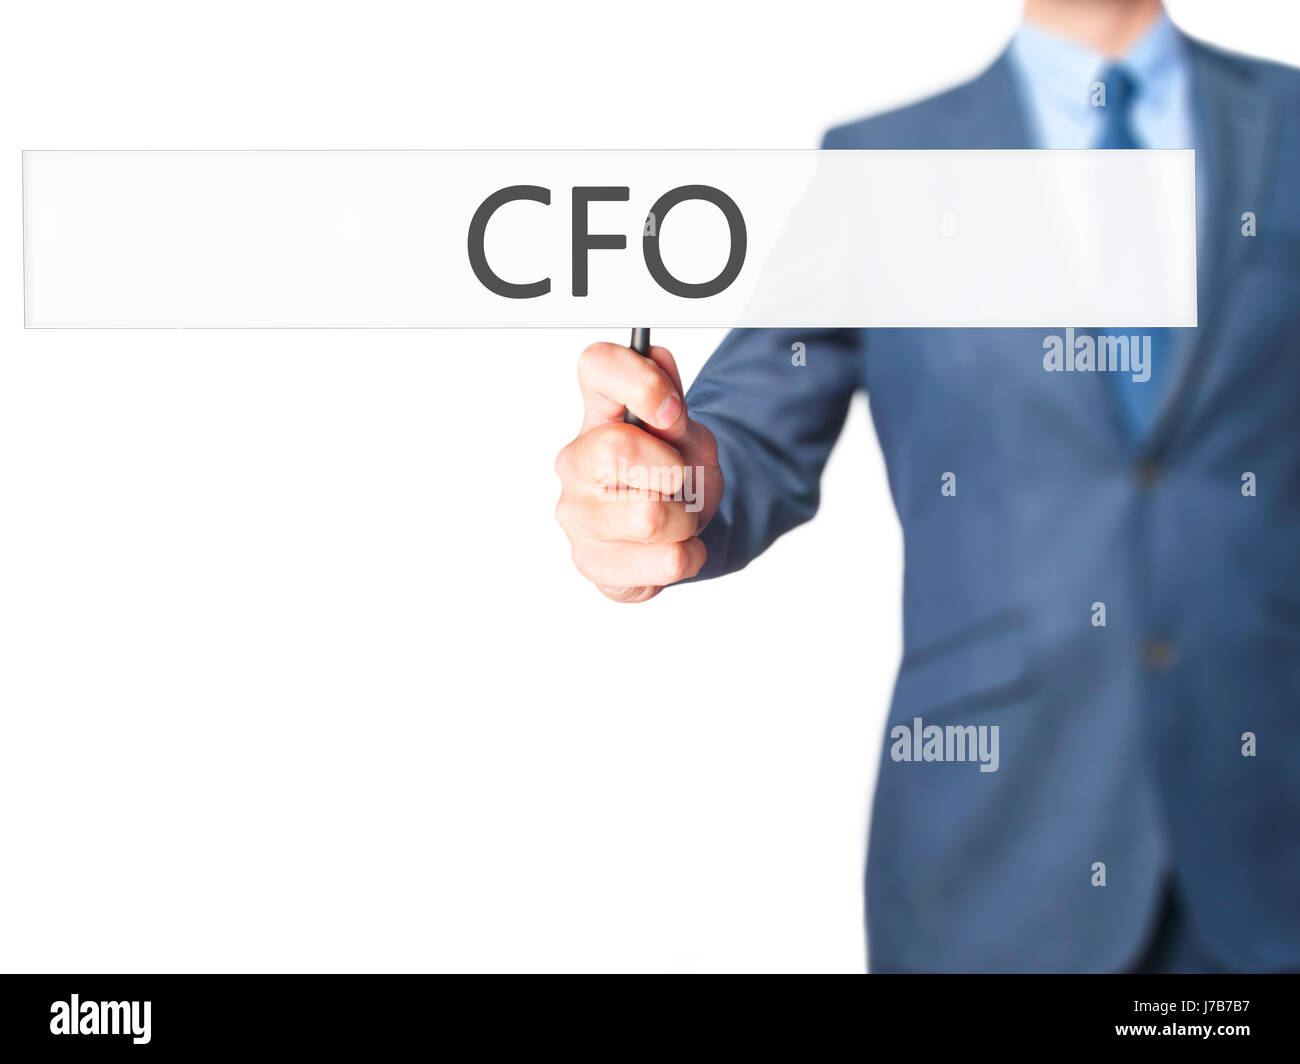 Chief financial officer cfo stockfotos chief financial officer cfo bilder alamy - Chief financial officer cfo ...